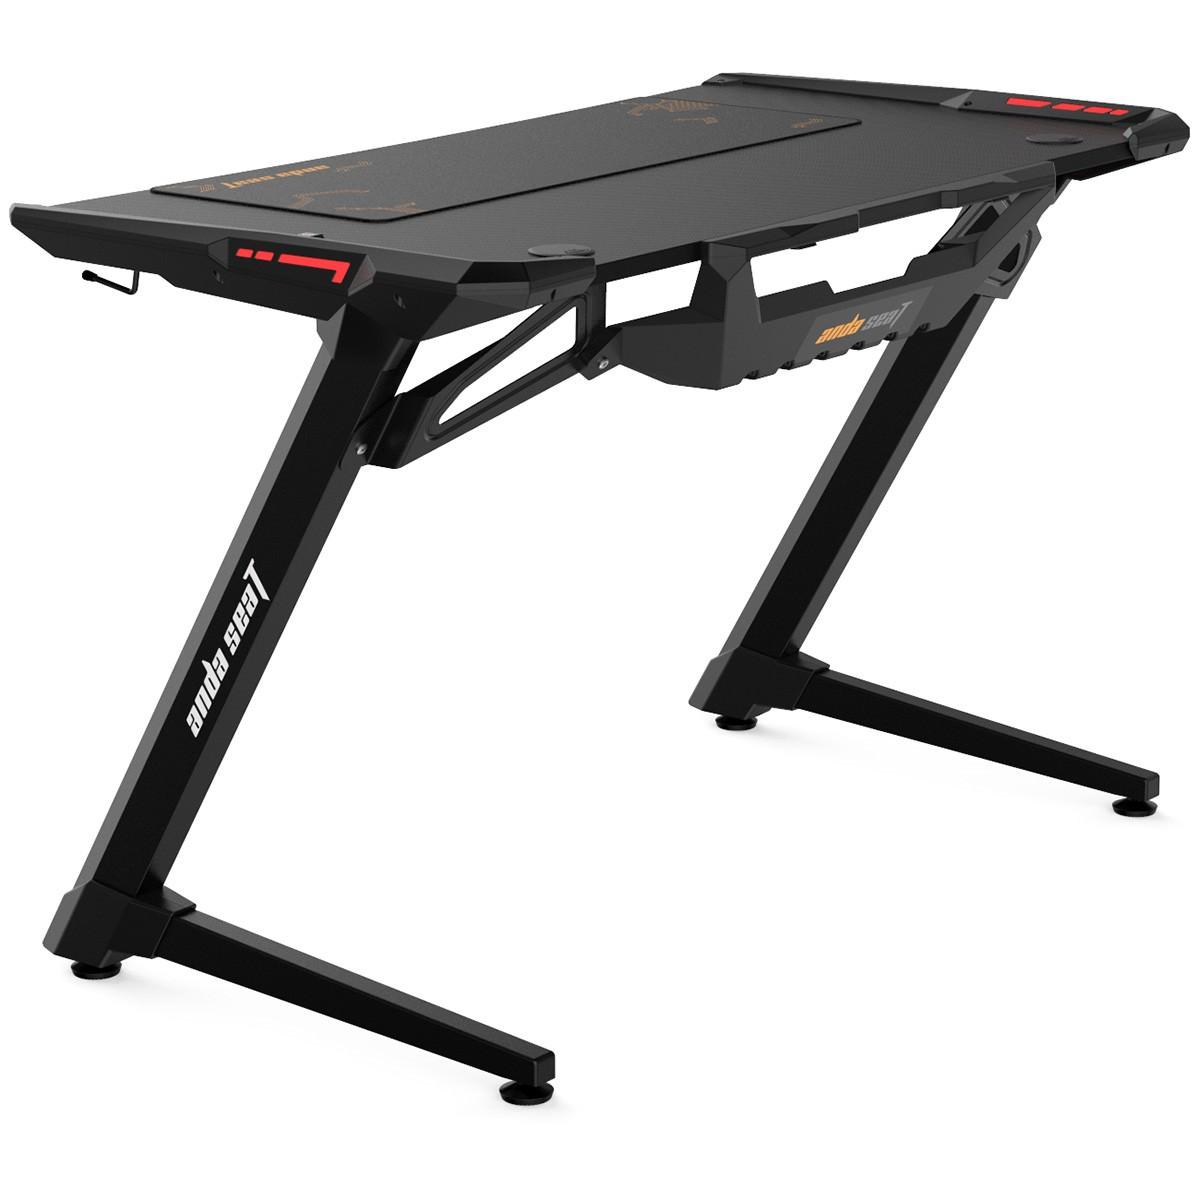 Anda Seat 1200-04 RGB Gaming Desk, 120cm, Black